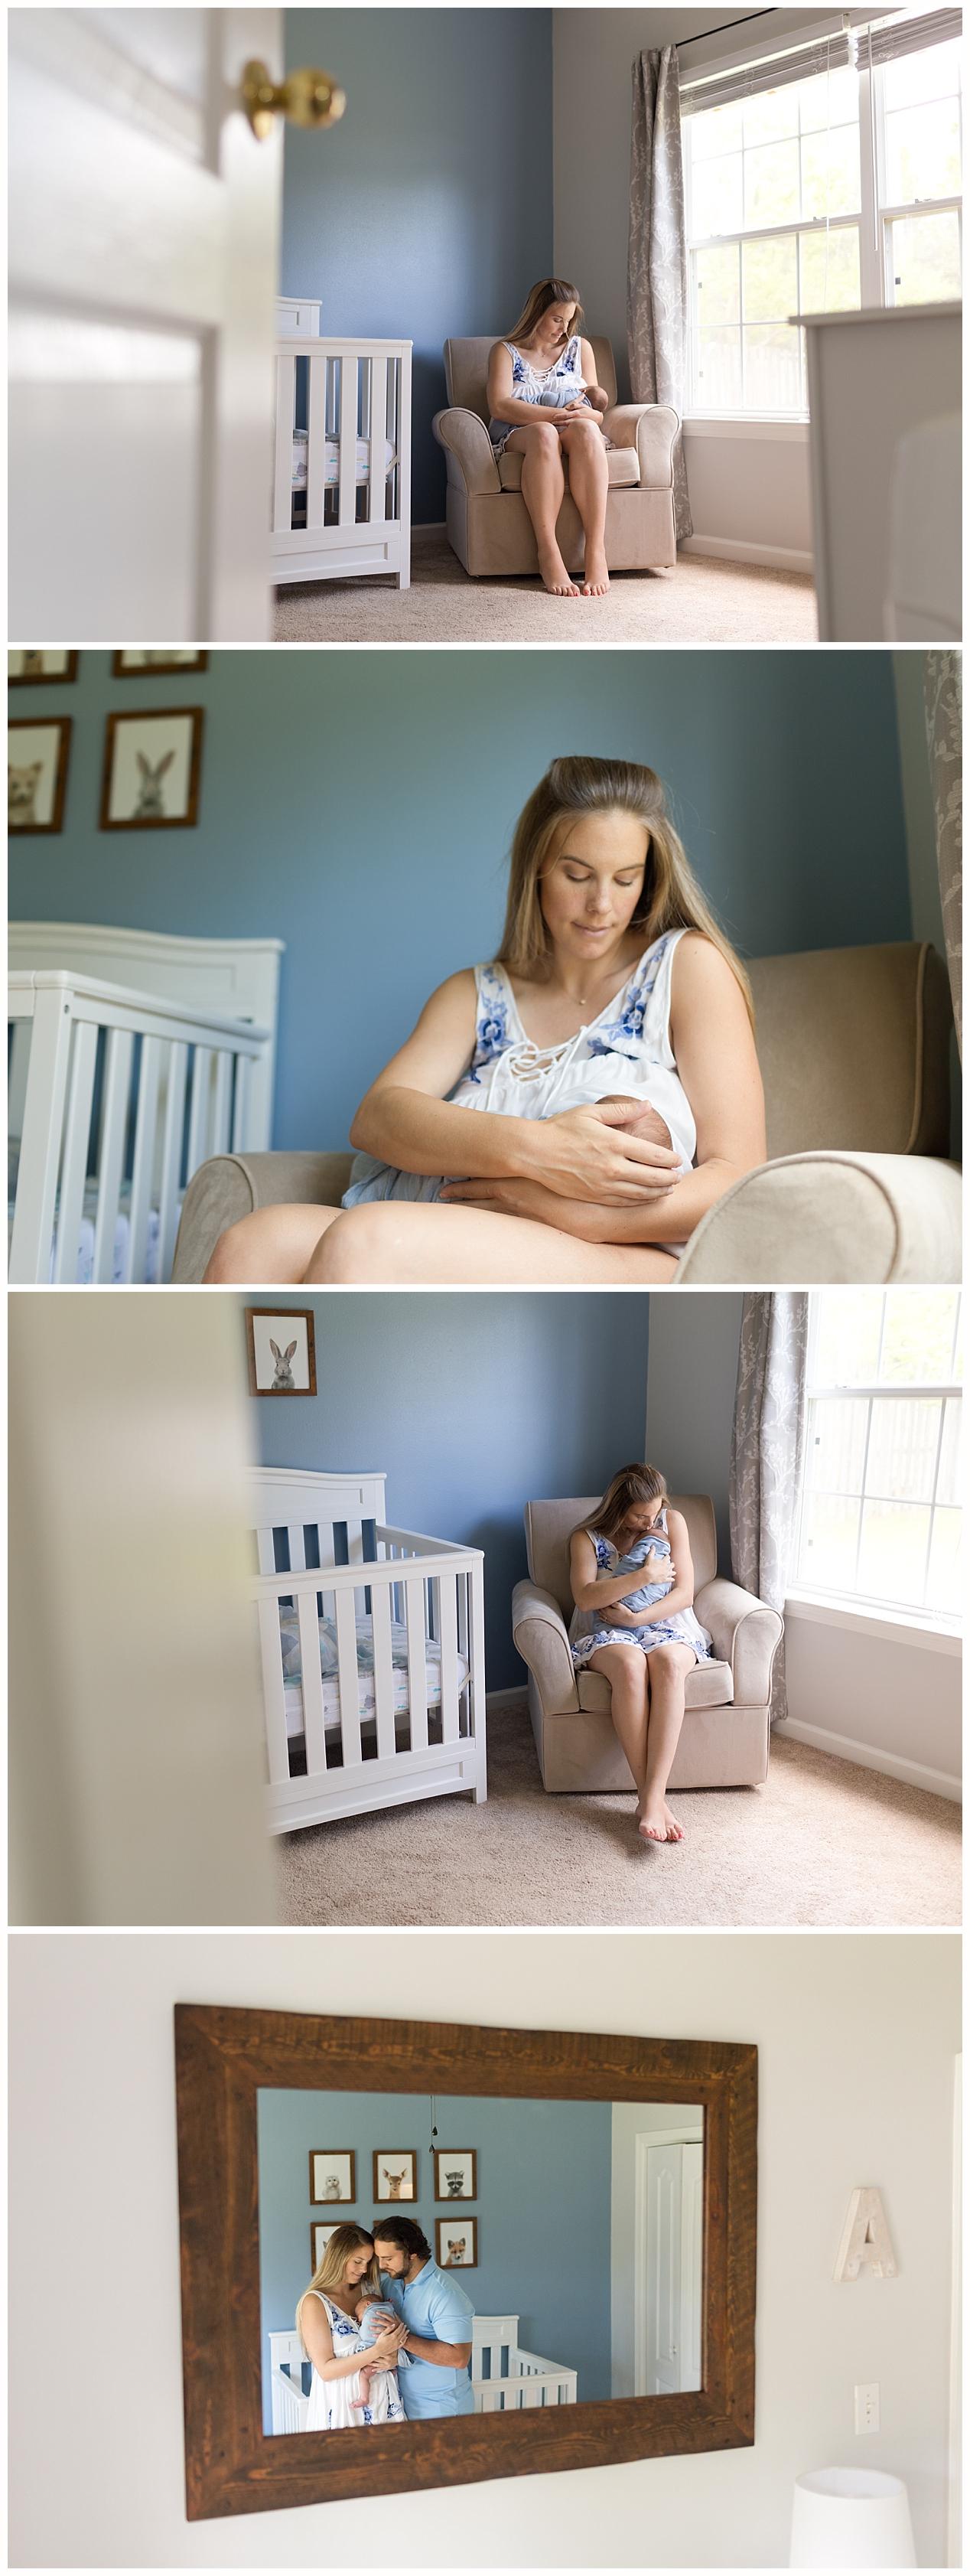 modest breastfeeding photos in nursery - Ocean Springs lifestyle newborn photography